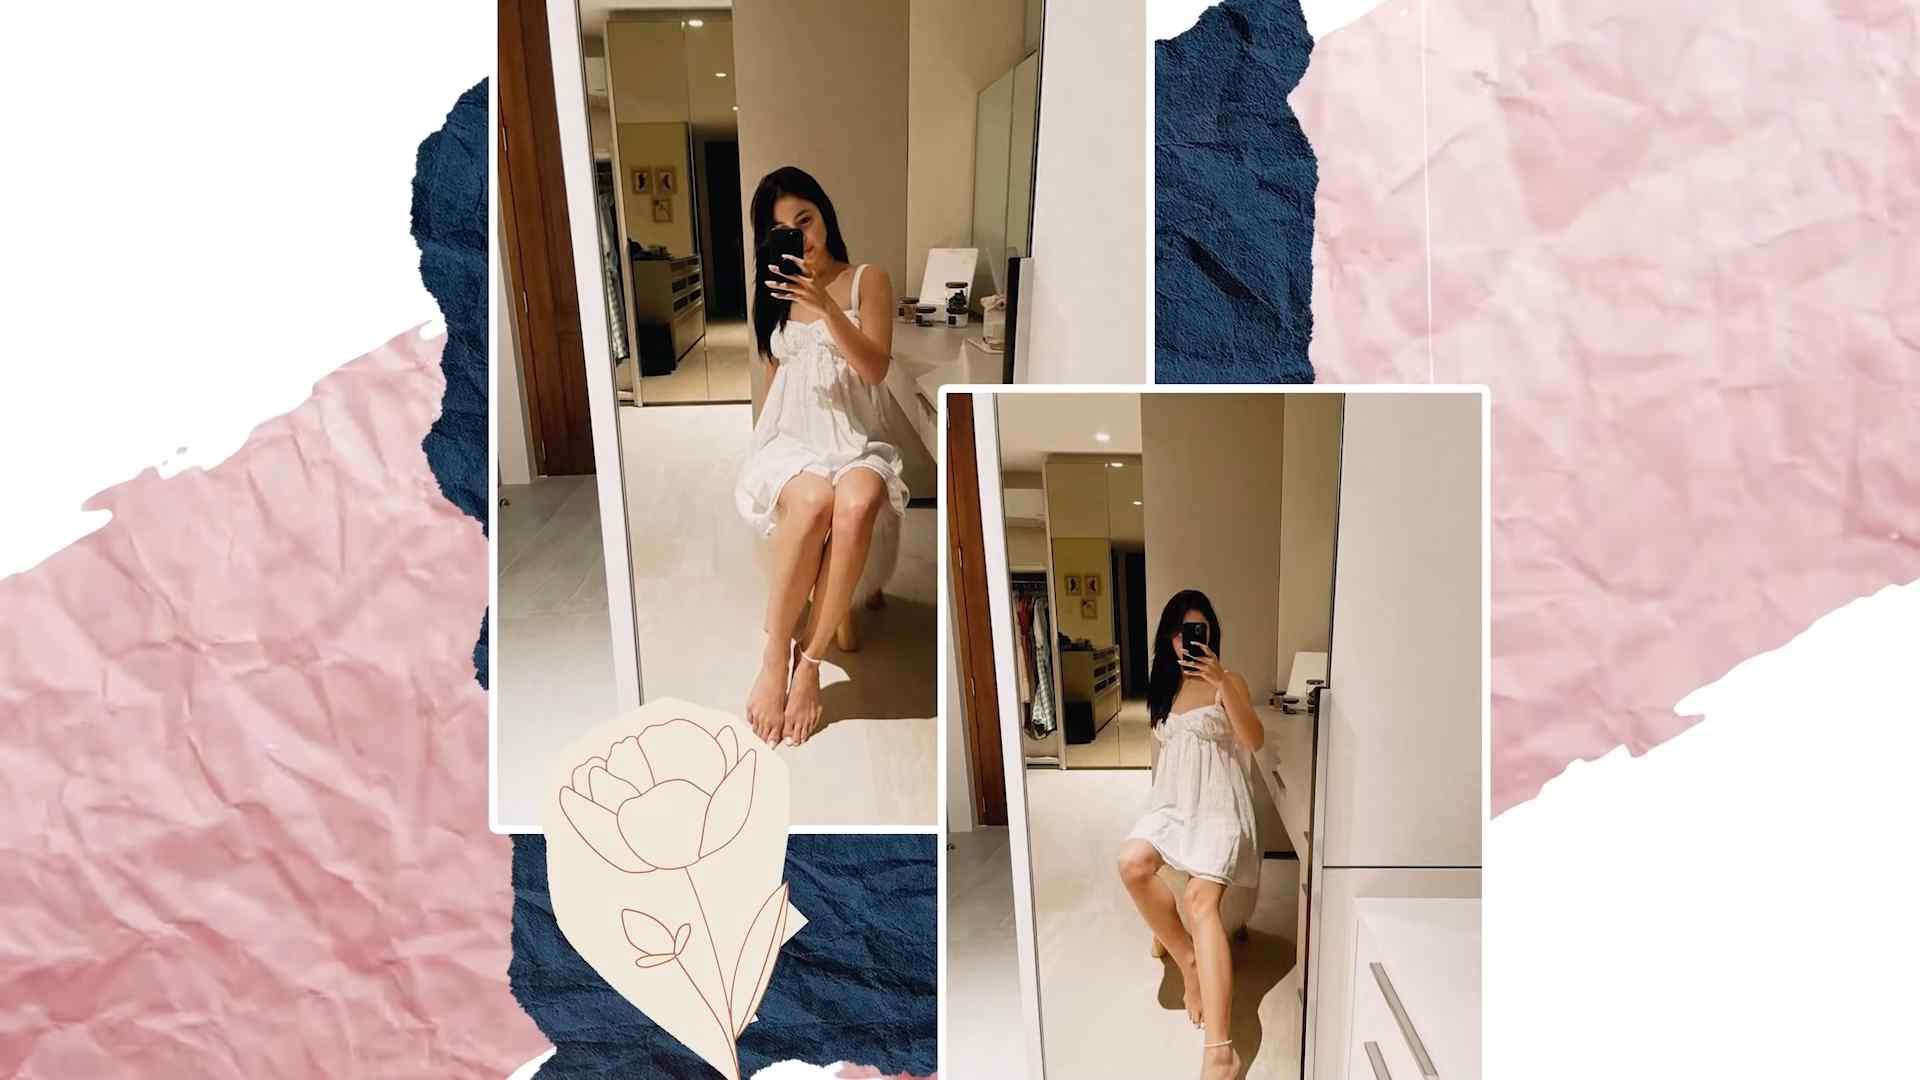 Julia Baretto's most worn clothes - little white dress